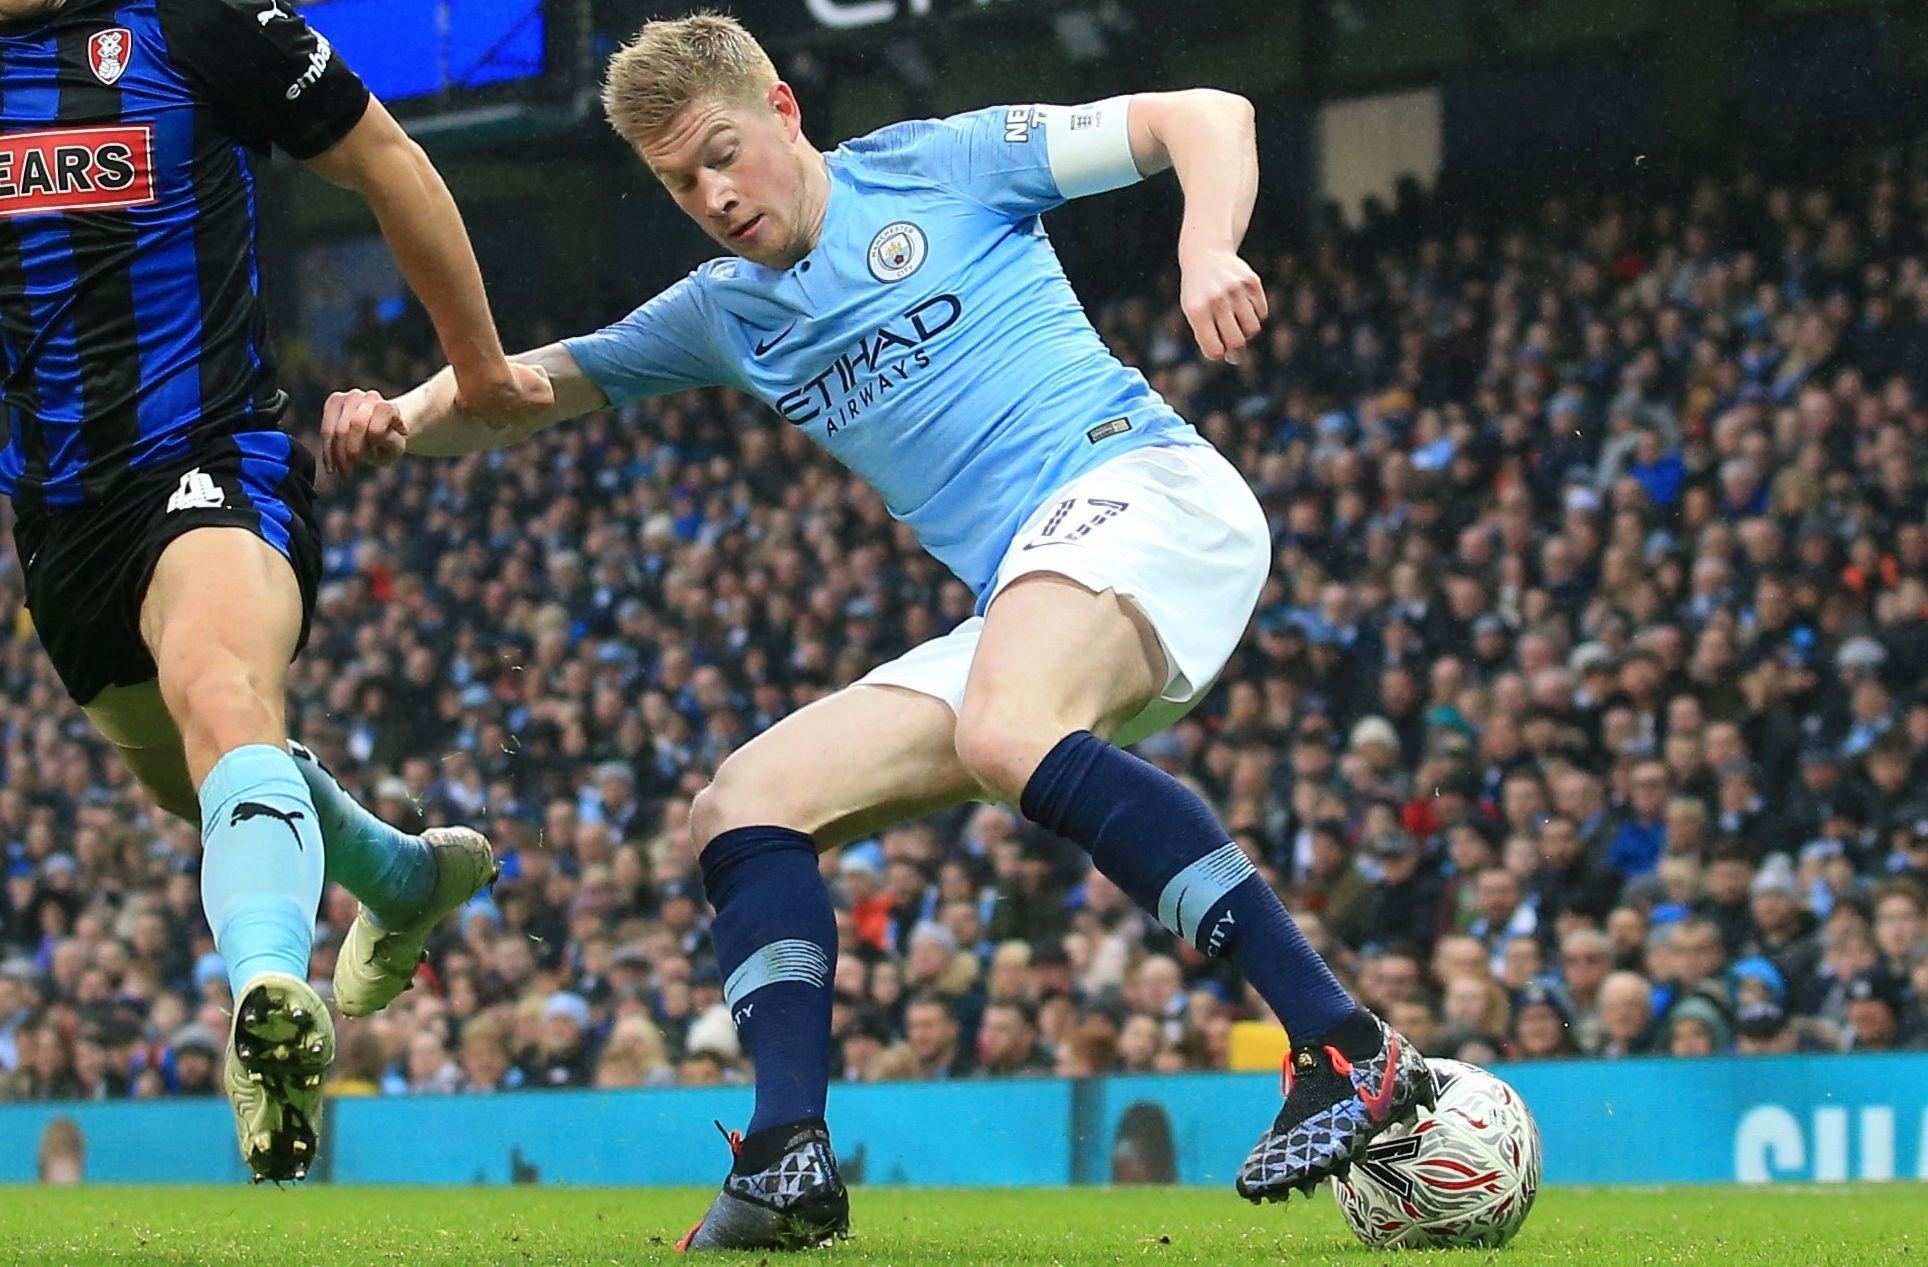 Football - Etranger - Premier League : Manchester City-Wolverhampton en direct